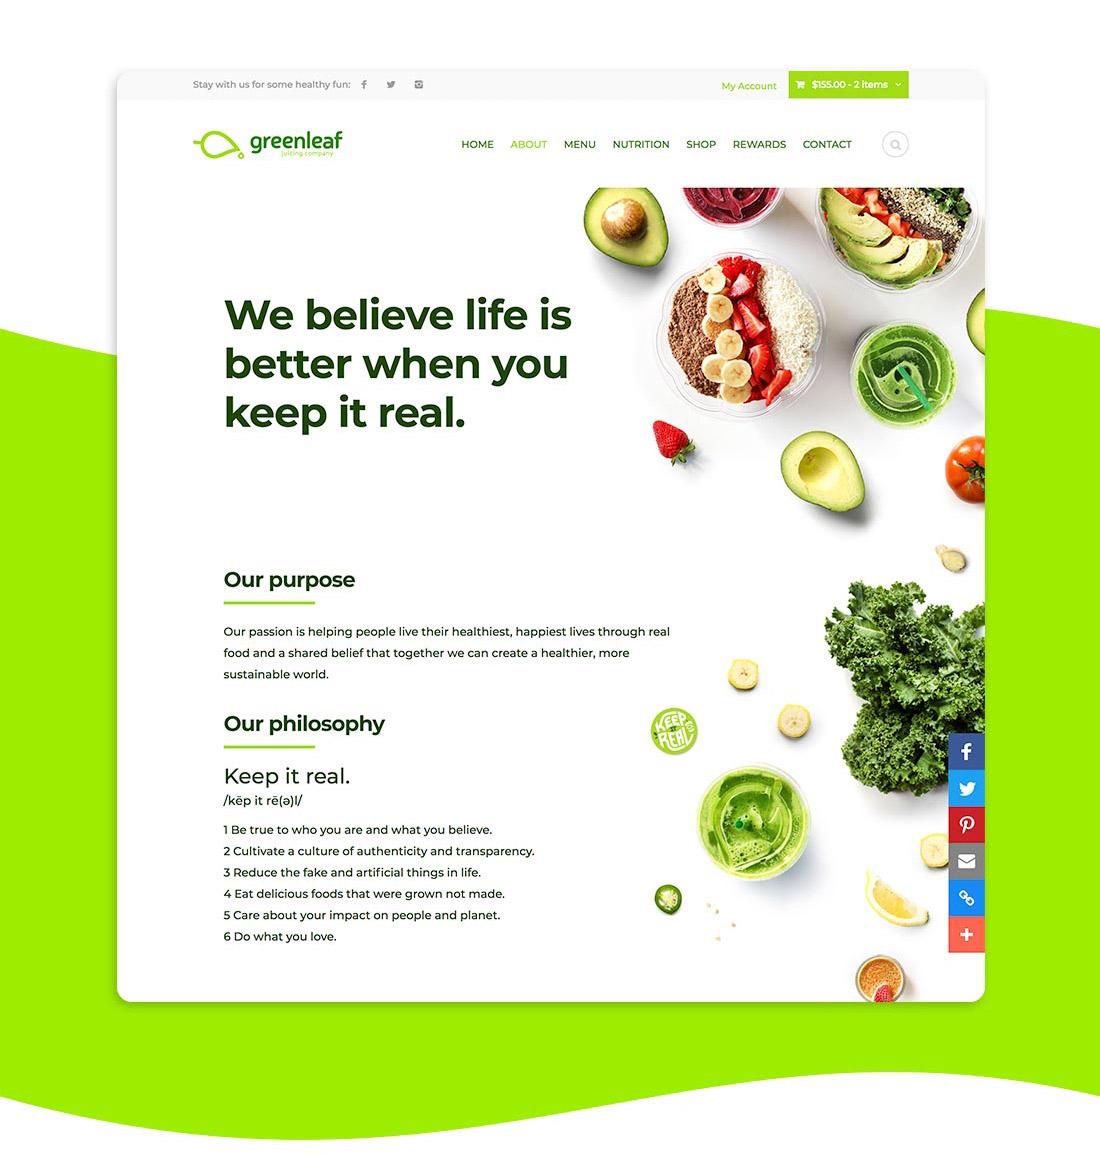 Greenleaf.com3